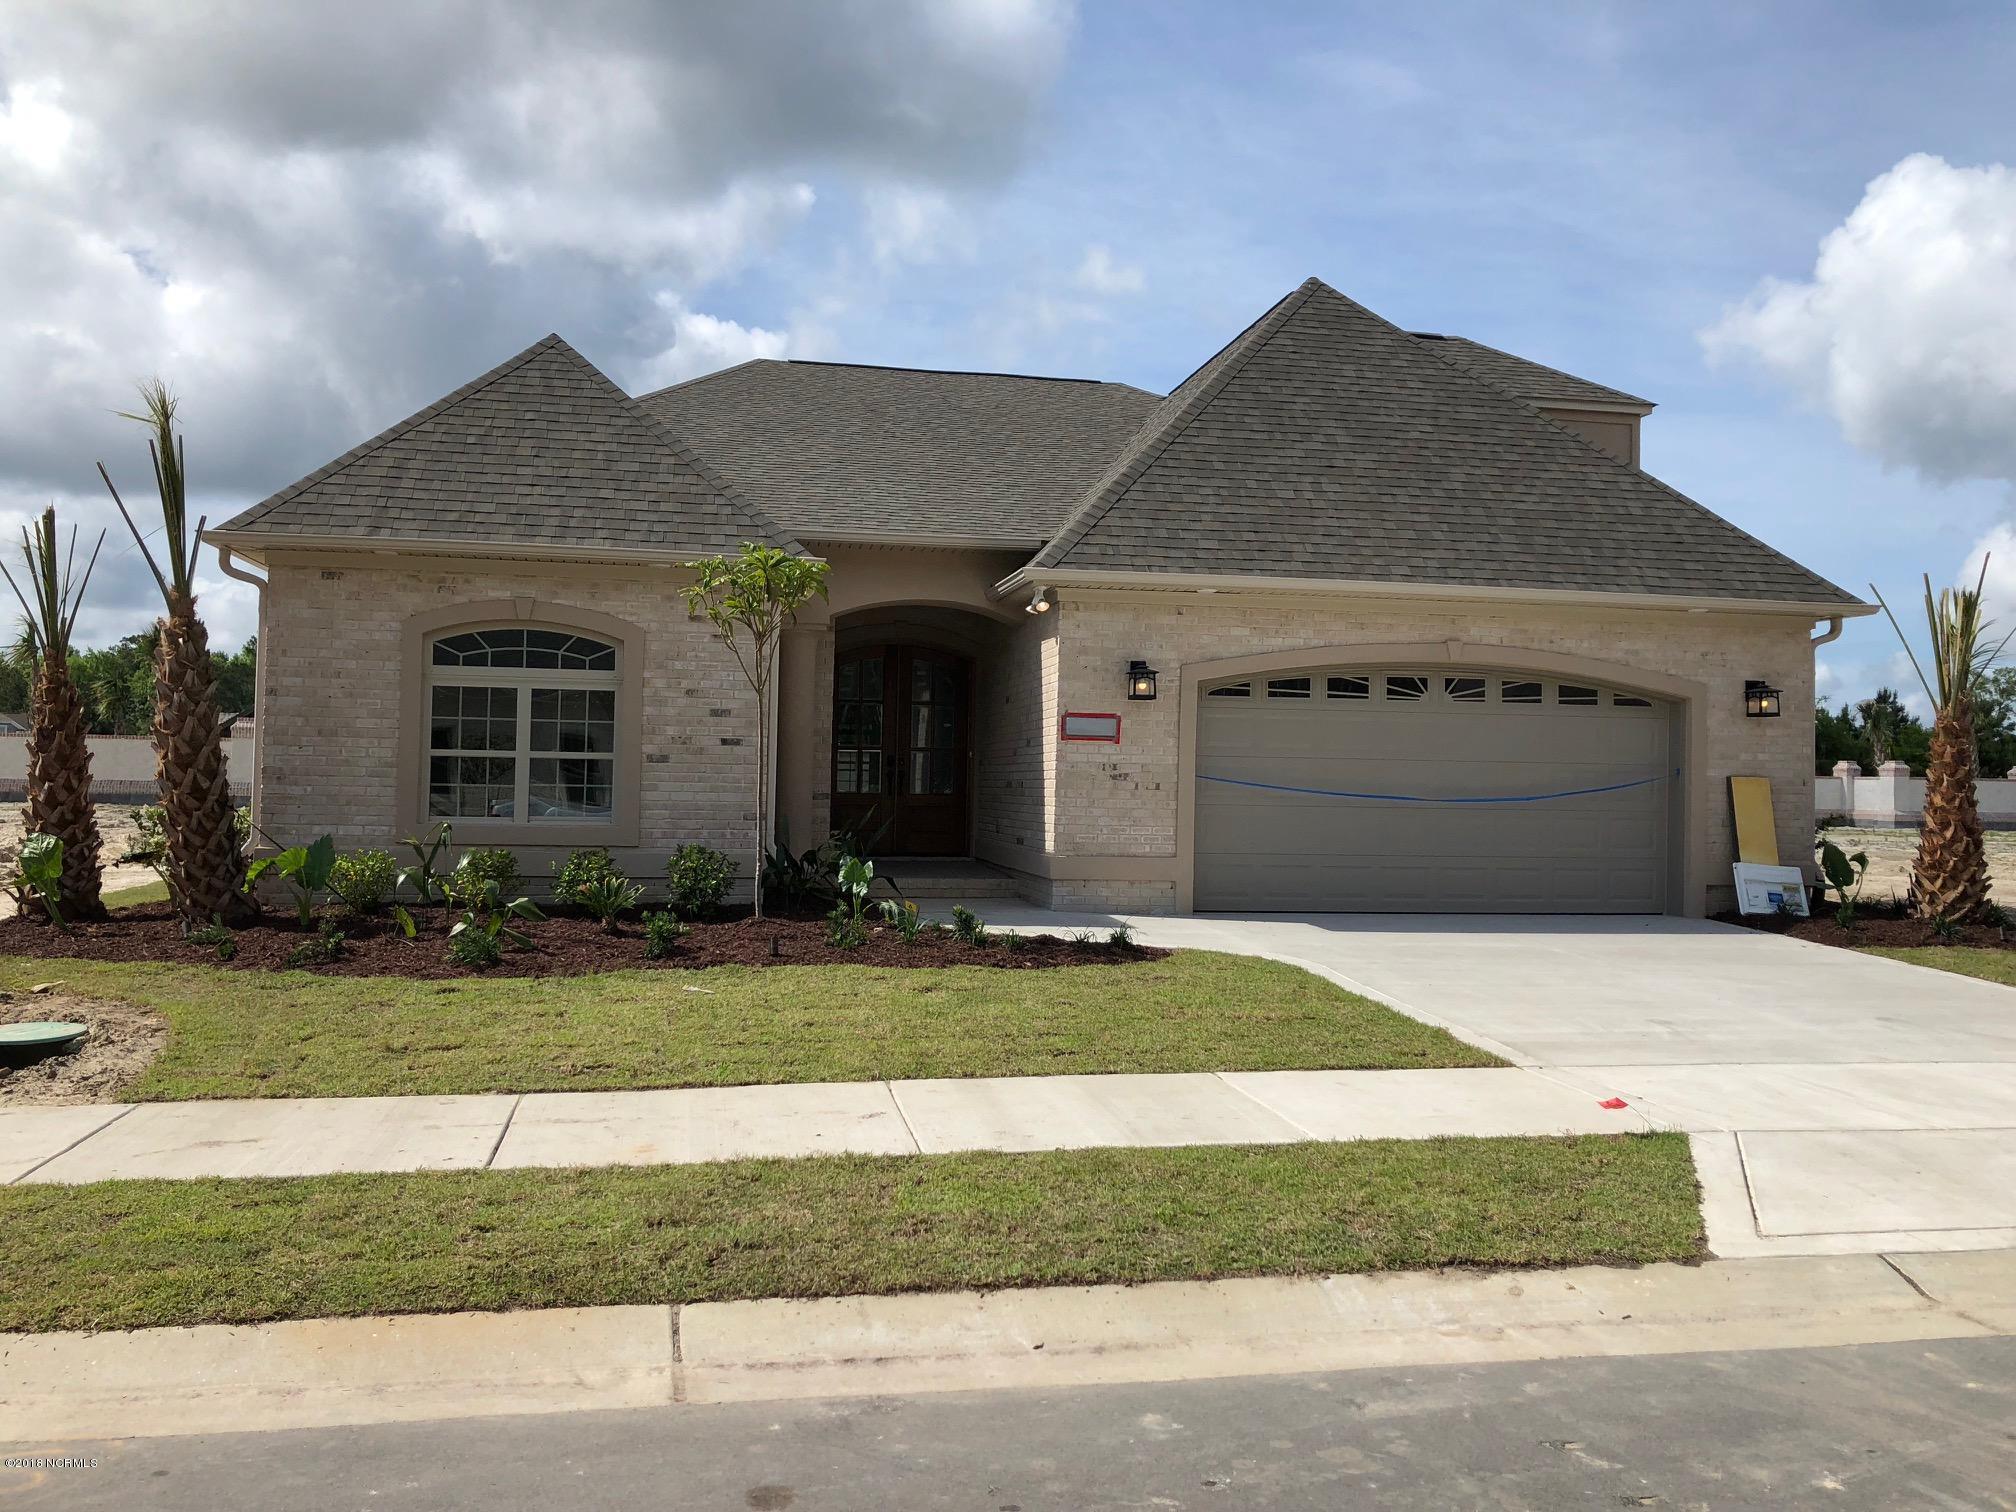 Carolina Plantations Real Estate - MLS Number: 100111525